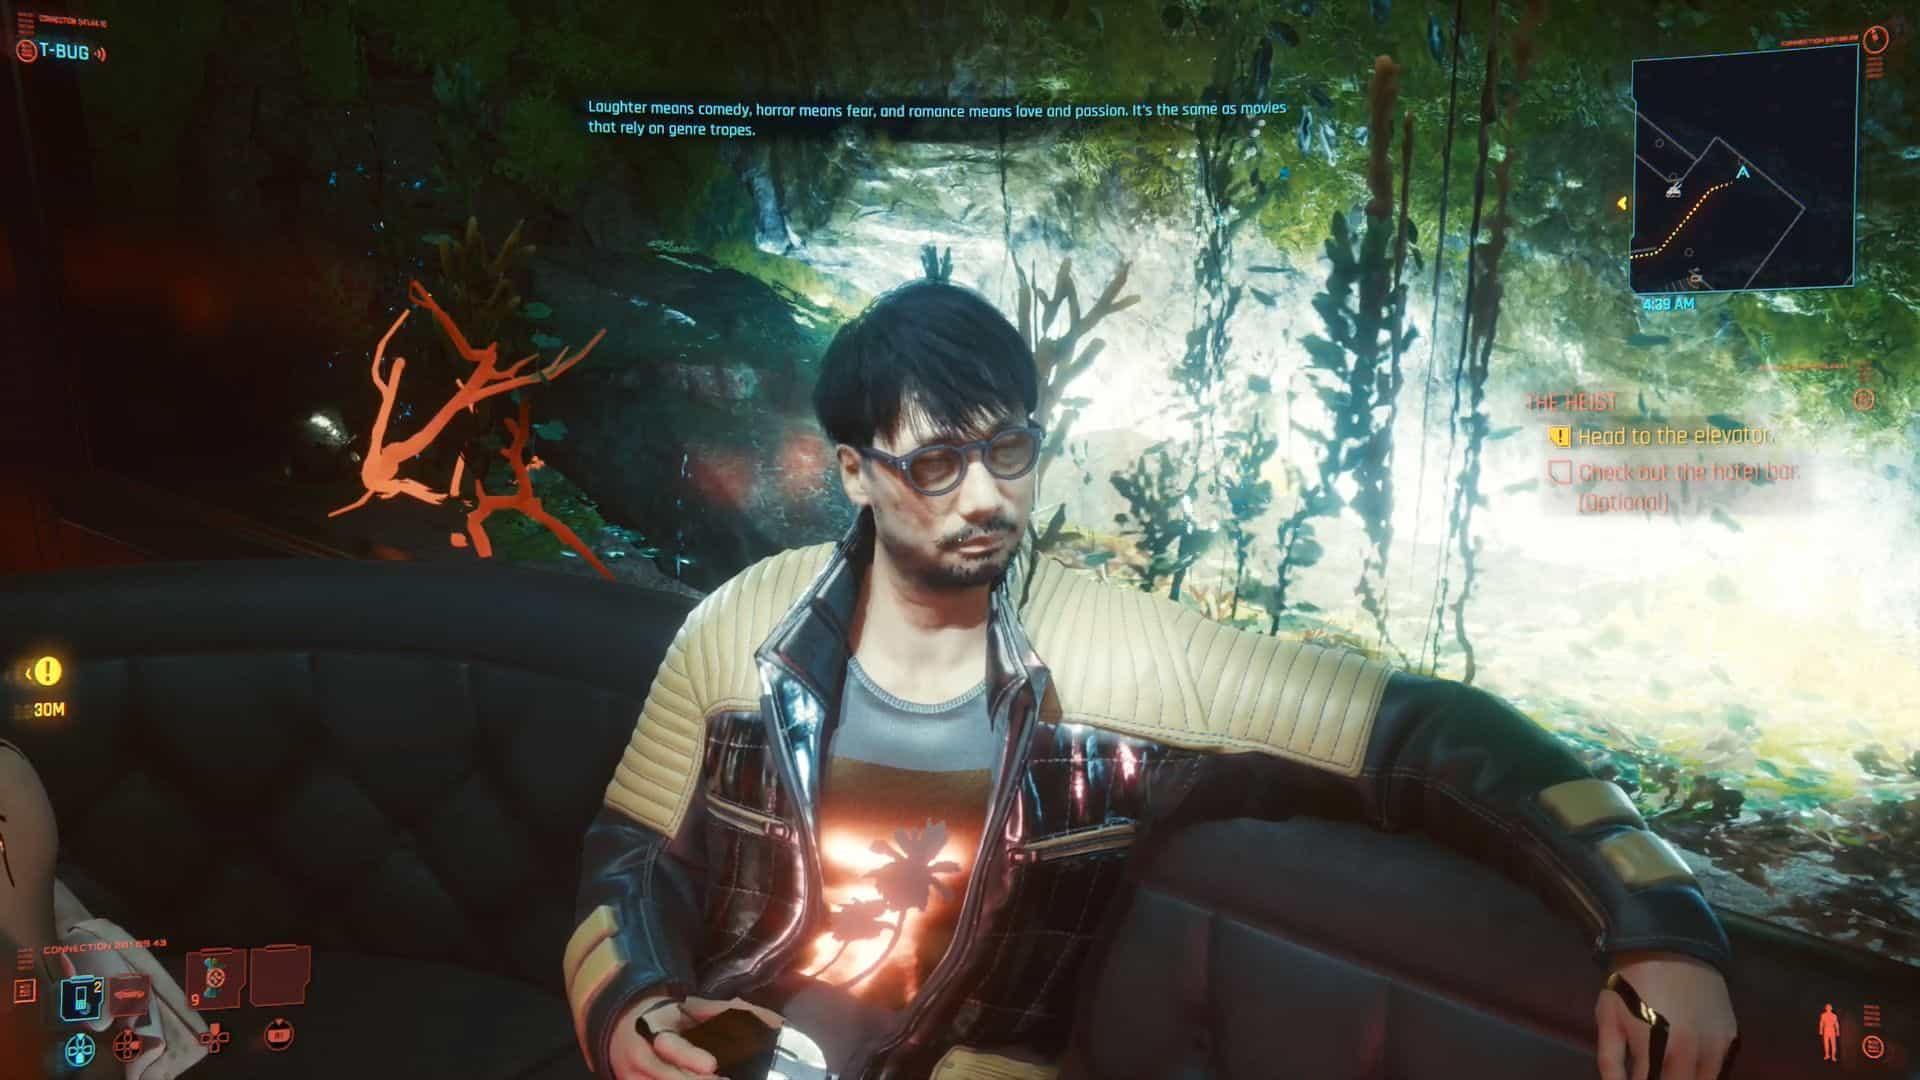 Hideo Kojima Cyberpunk 2077 Oshima